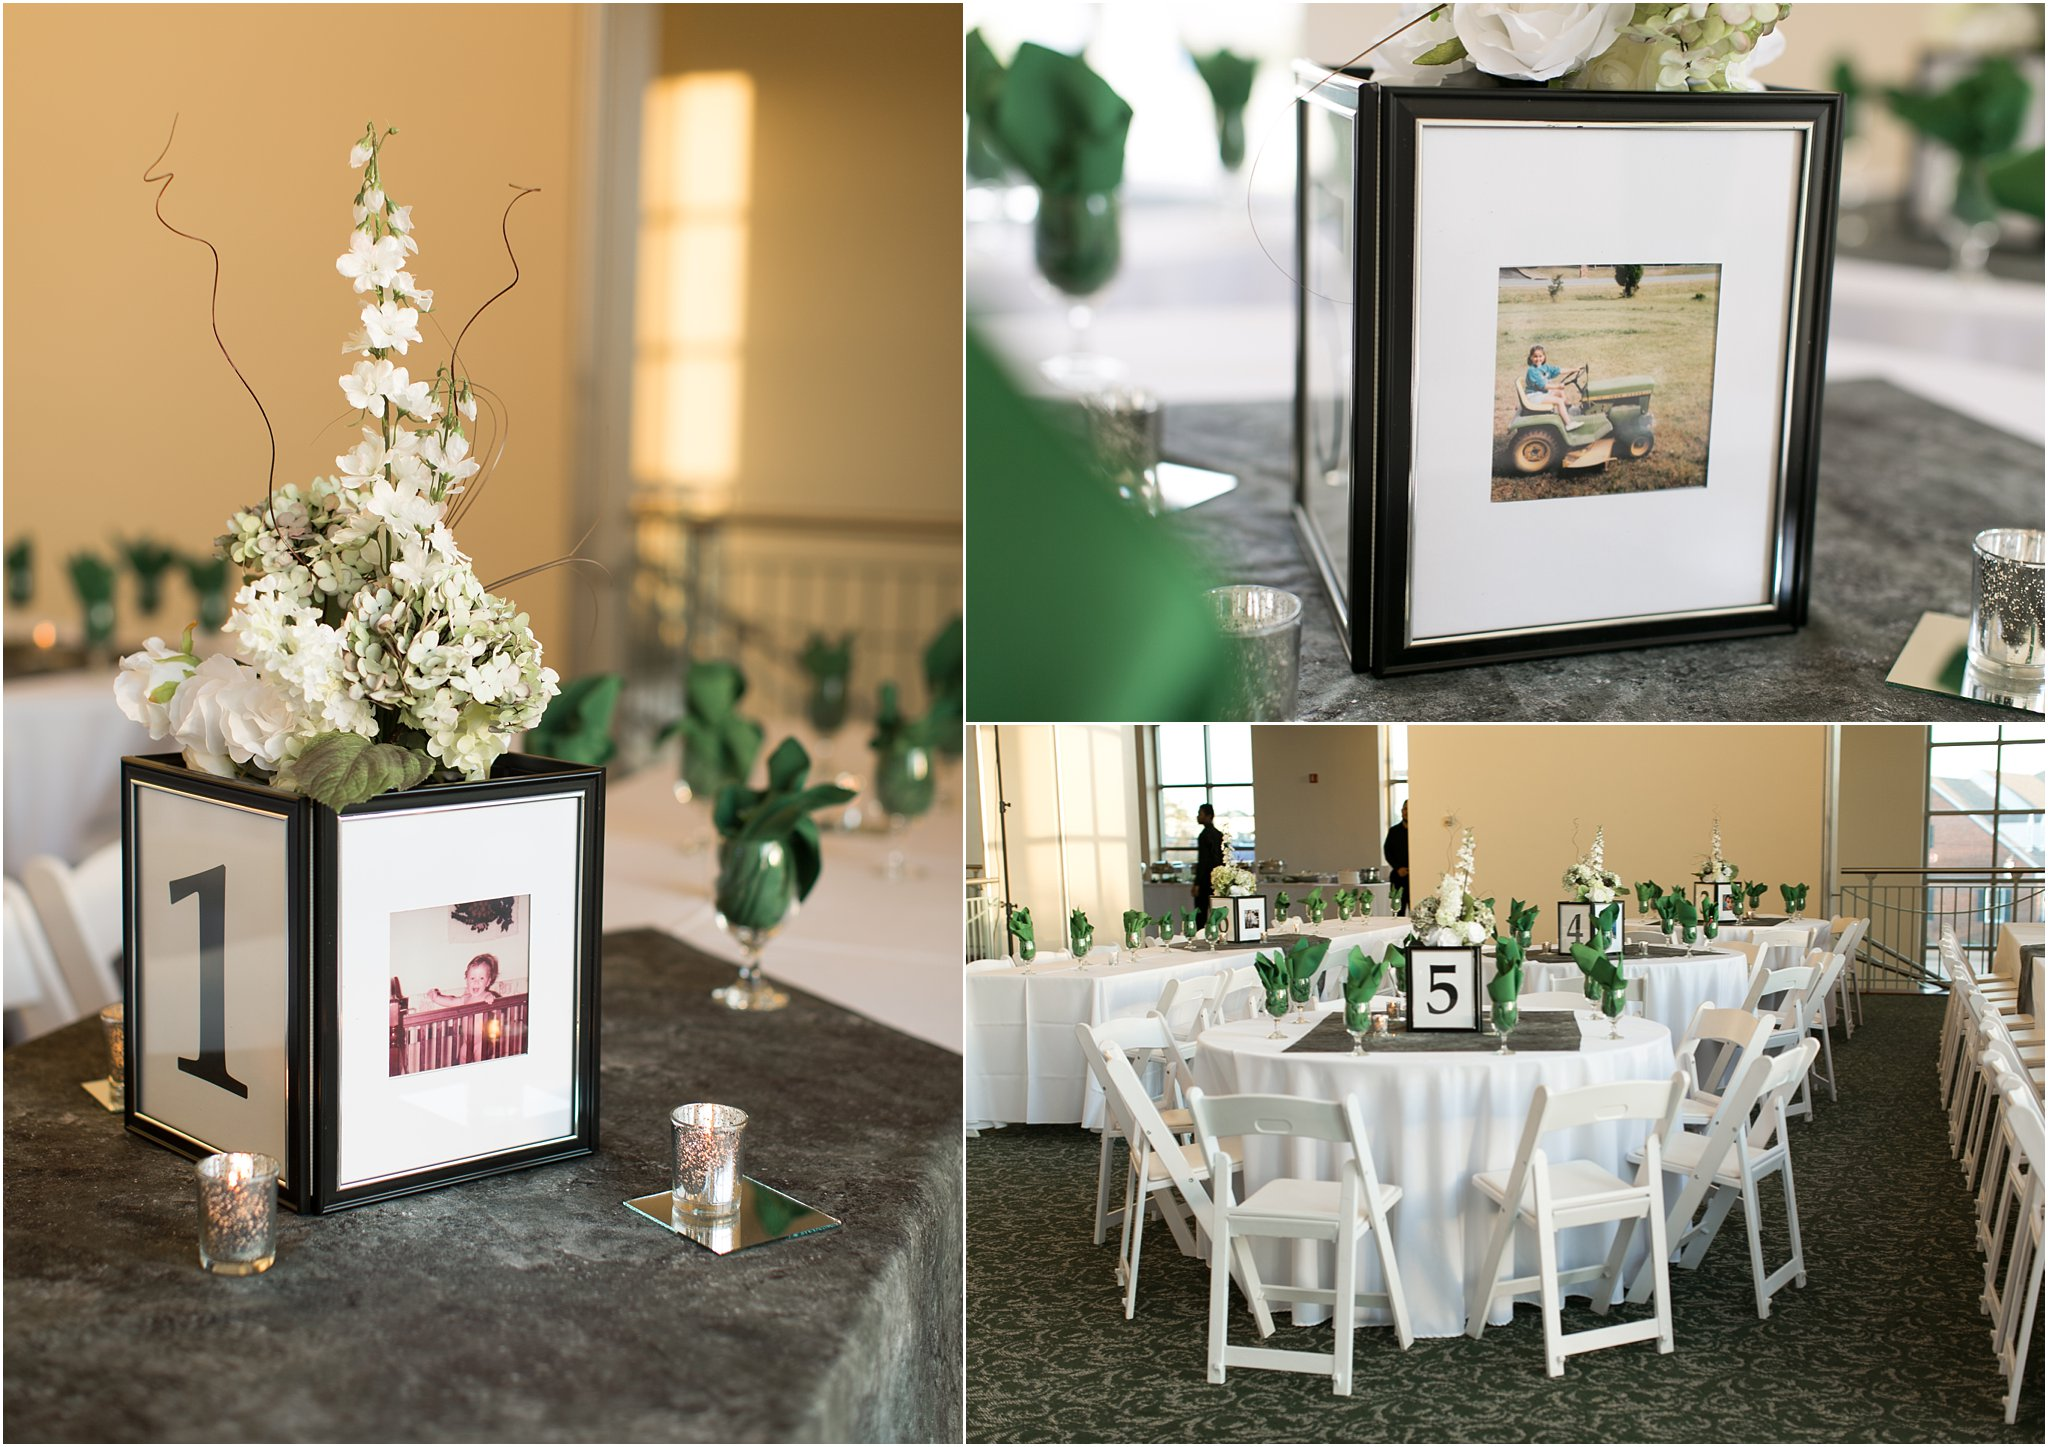 va_jessica_ryan_photography_virginia_wedding_norfolk_harrison_opera_house_norfolk_arts_district_portraits_3838